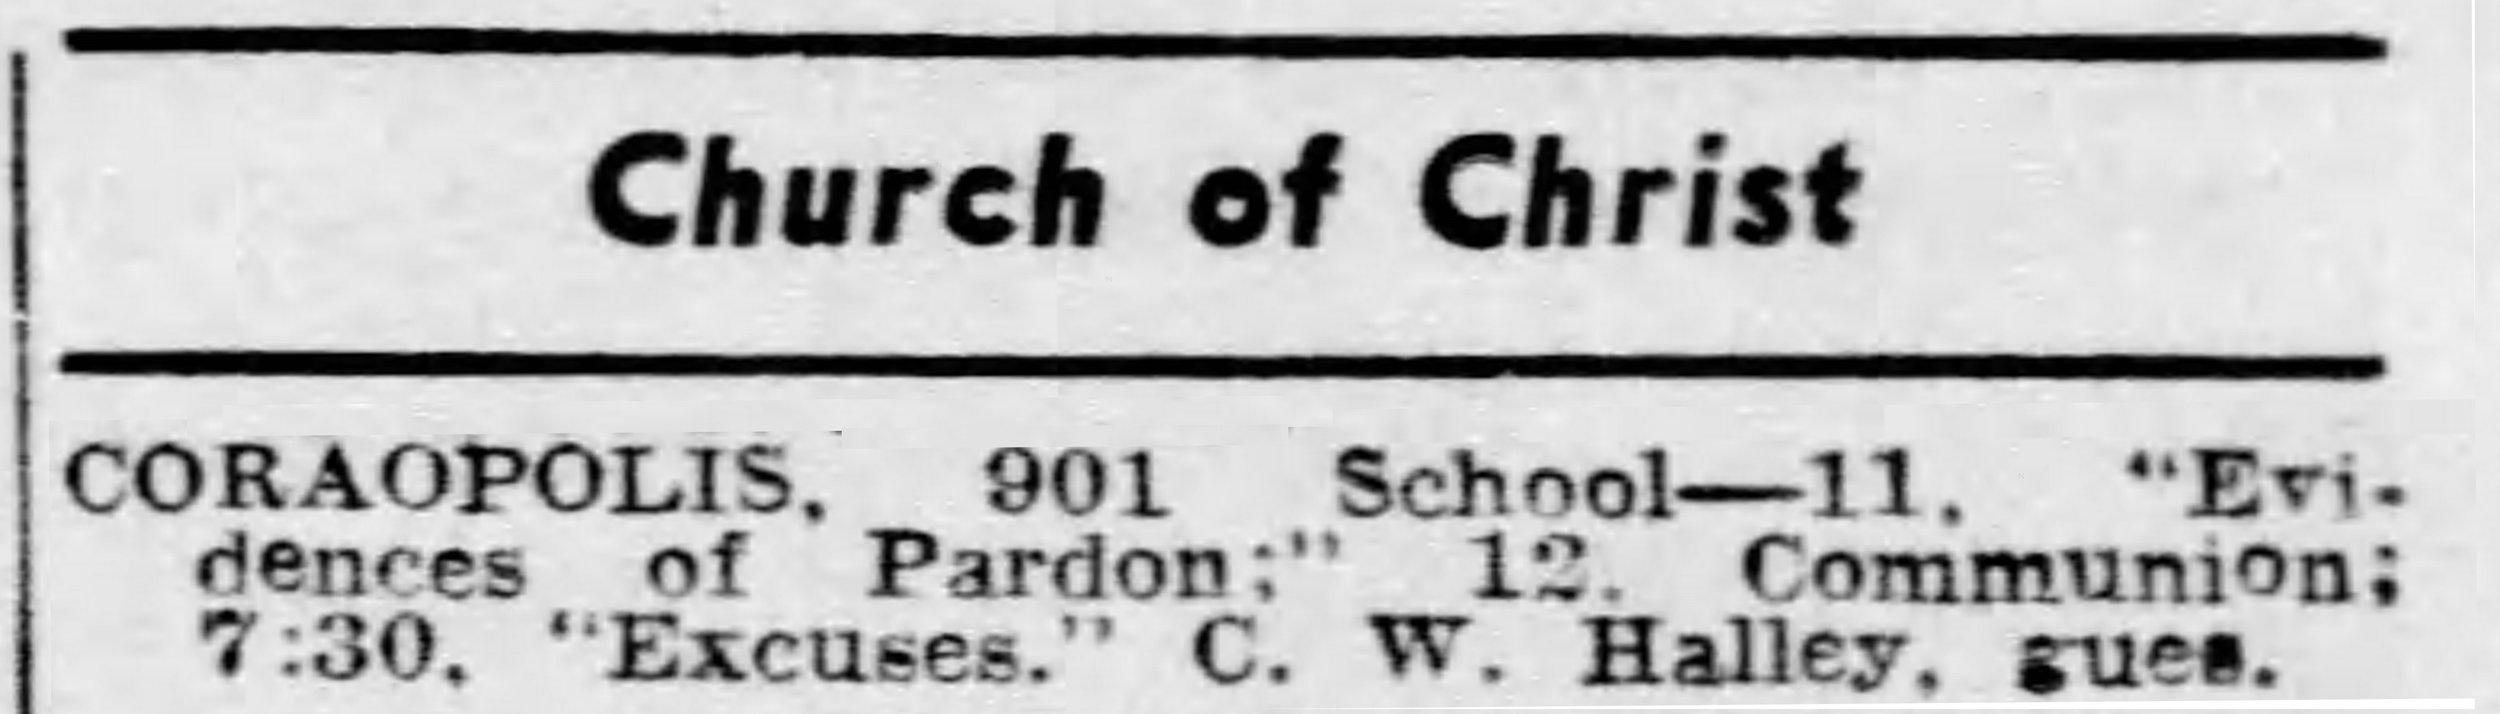 1942-10-31 The Pittsburgh Press (v59, n125, p6)